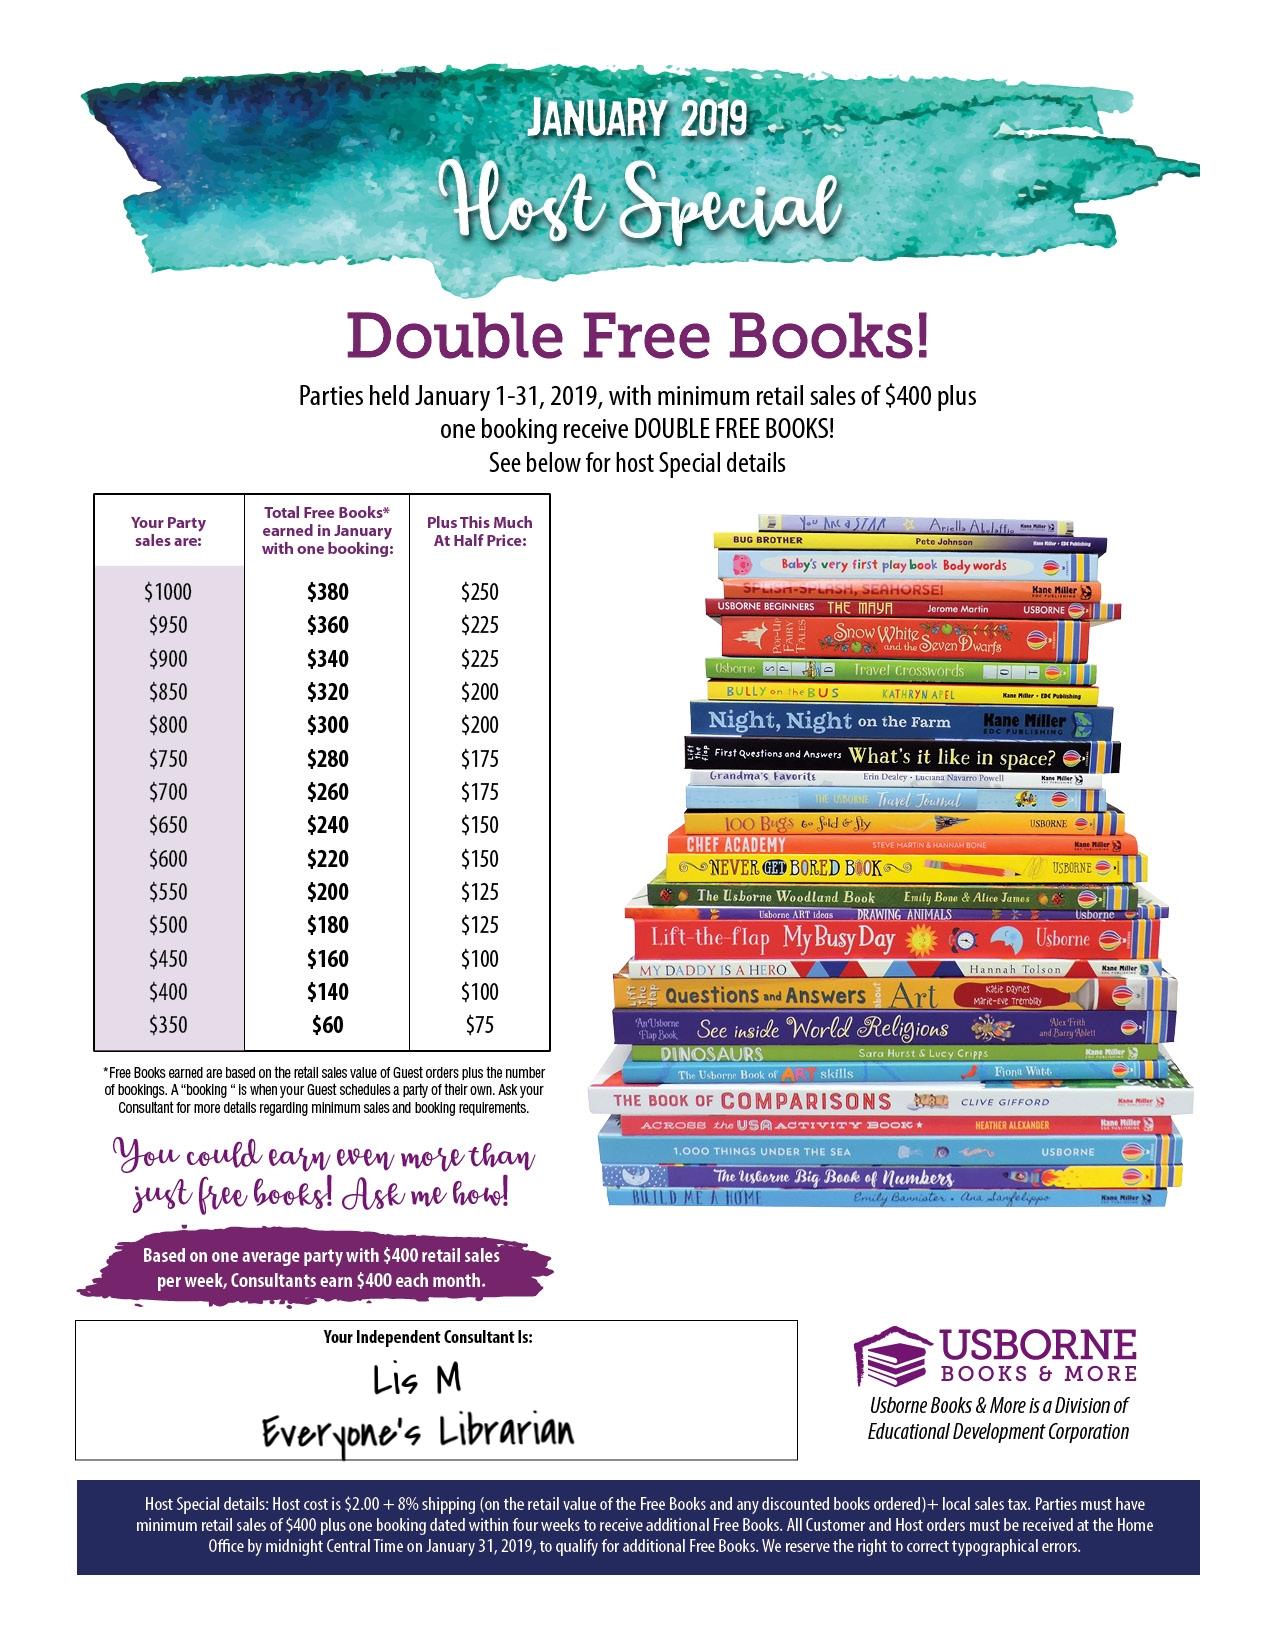 January Usborne Books More Hostess Rewards Everyone S Librarian